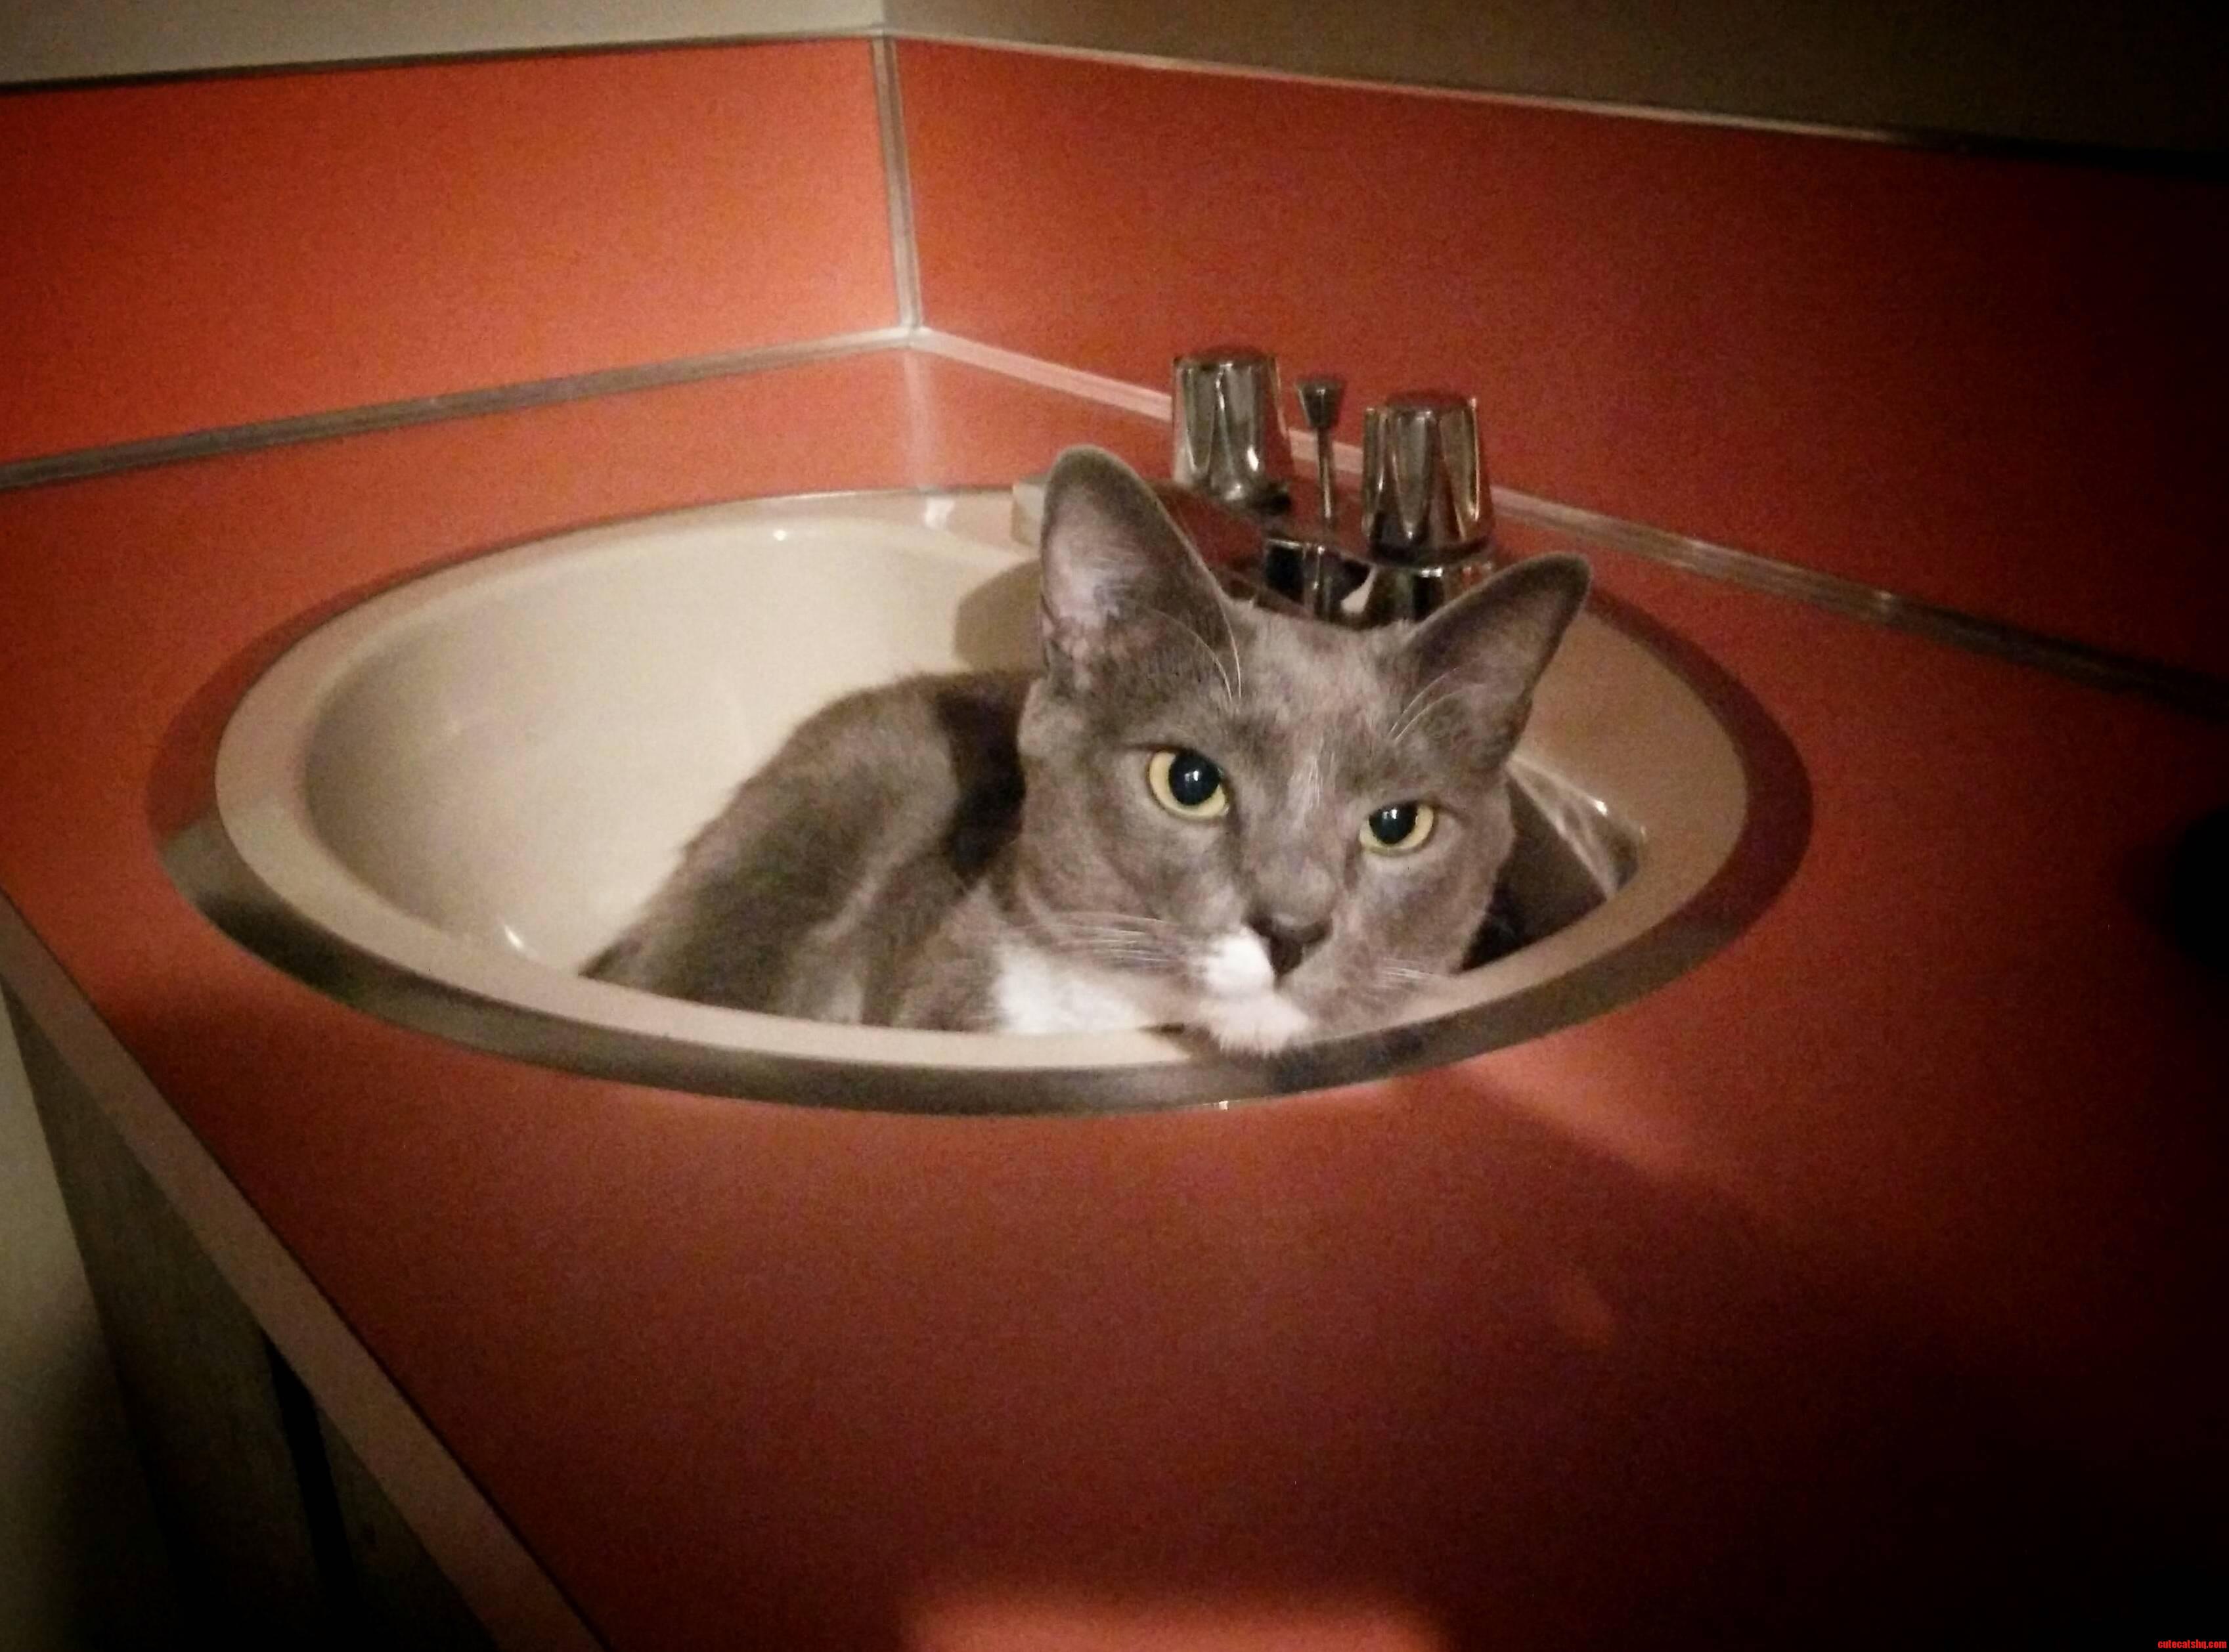 My friends cat likes sleeping in the bath sink